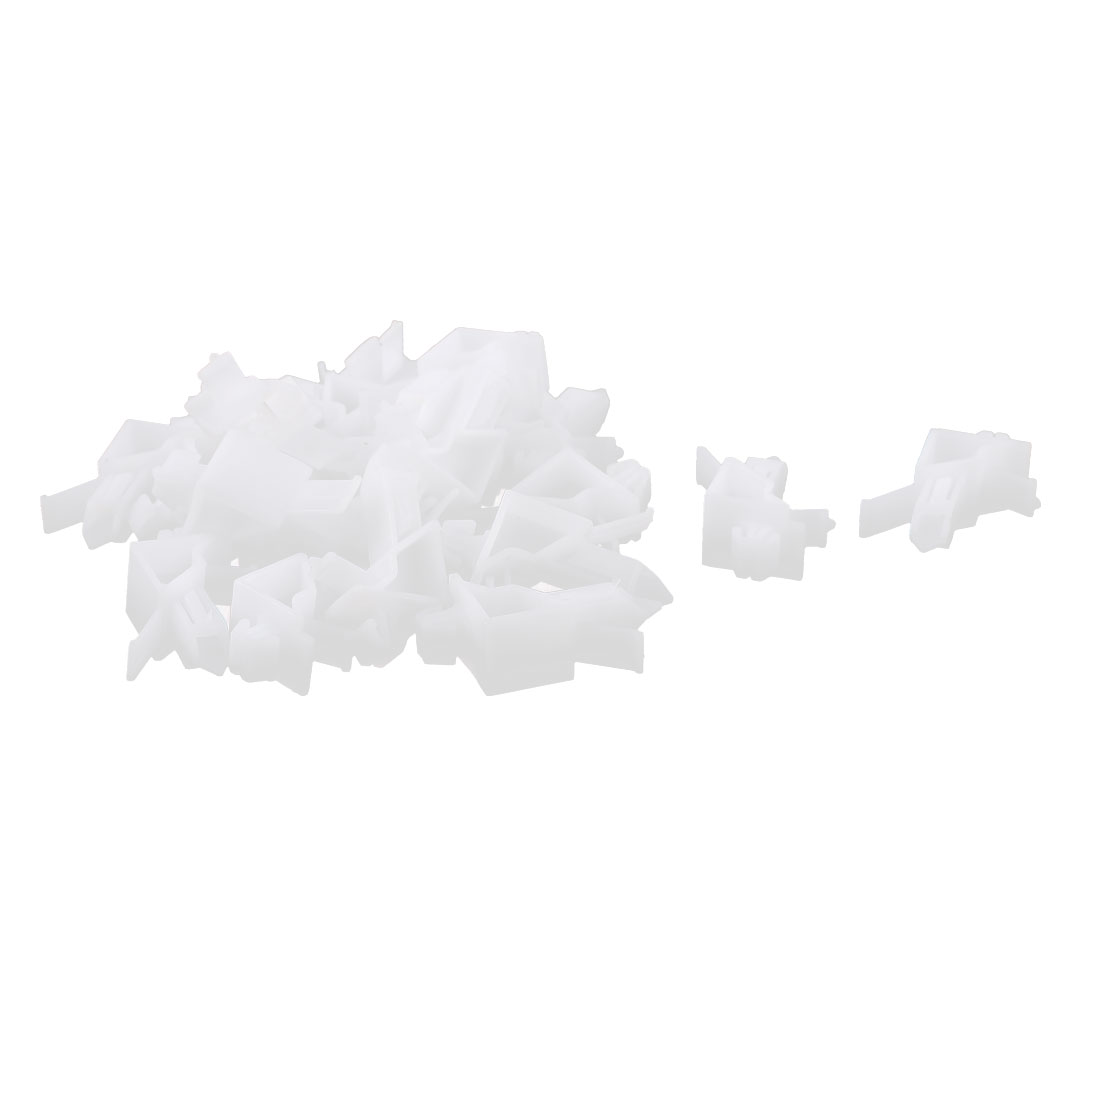 20 Pcs White Plastic Rivet Bumper Lining Trim Panel Retainer Fastener Clips for Toyota Prado